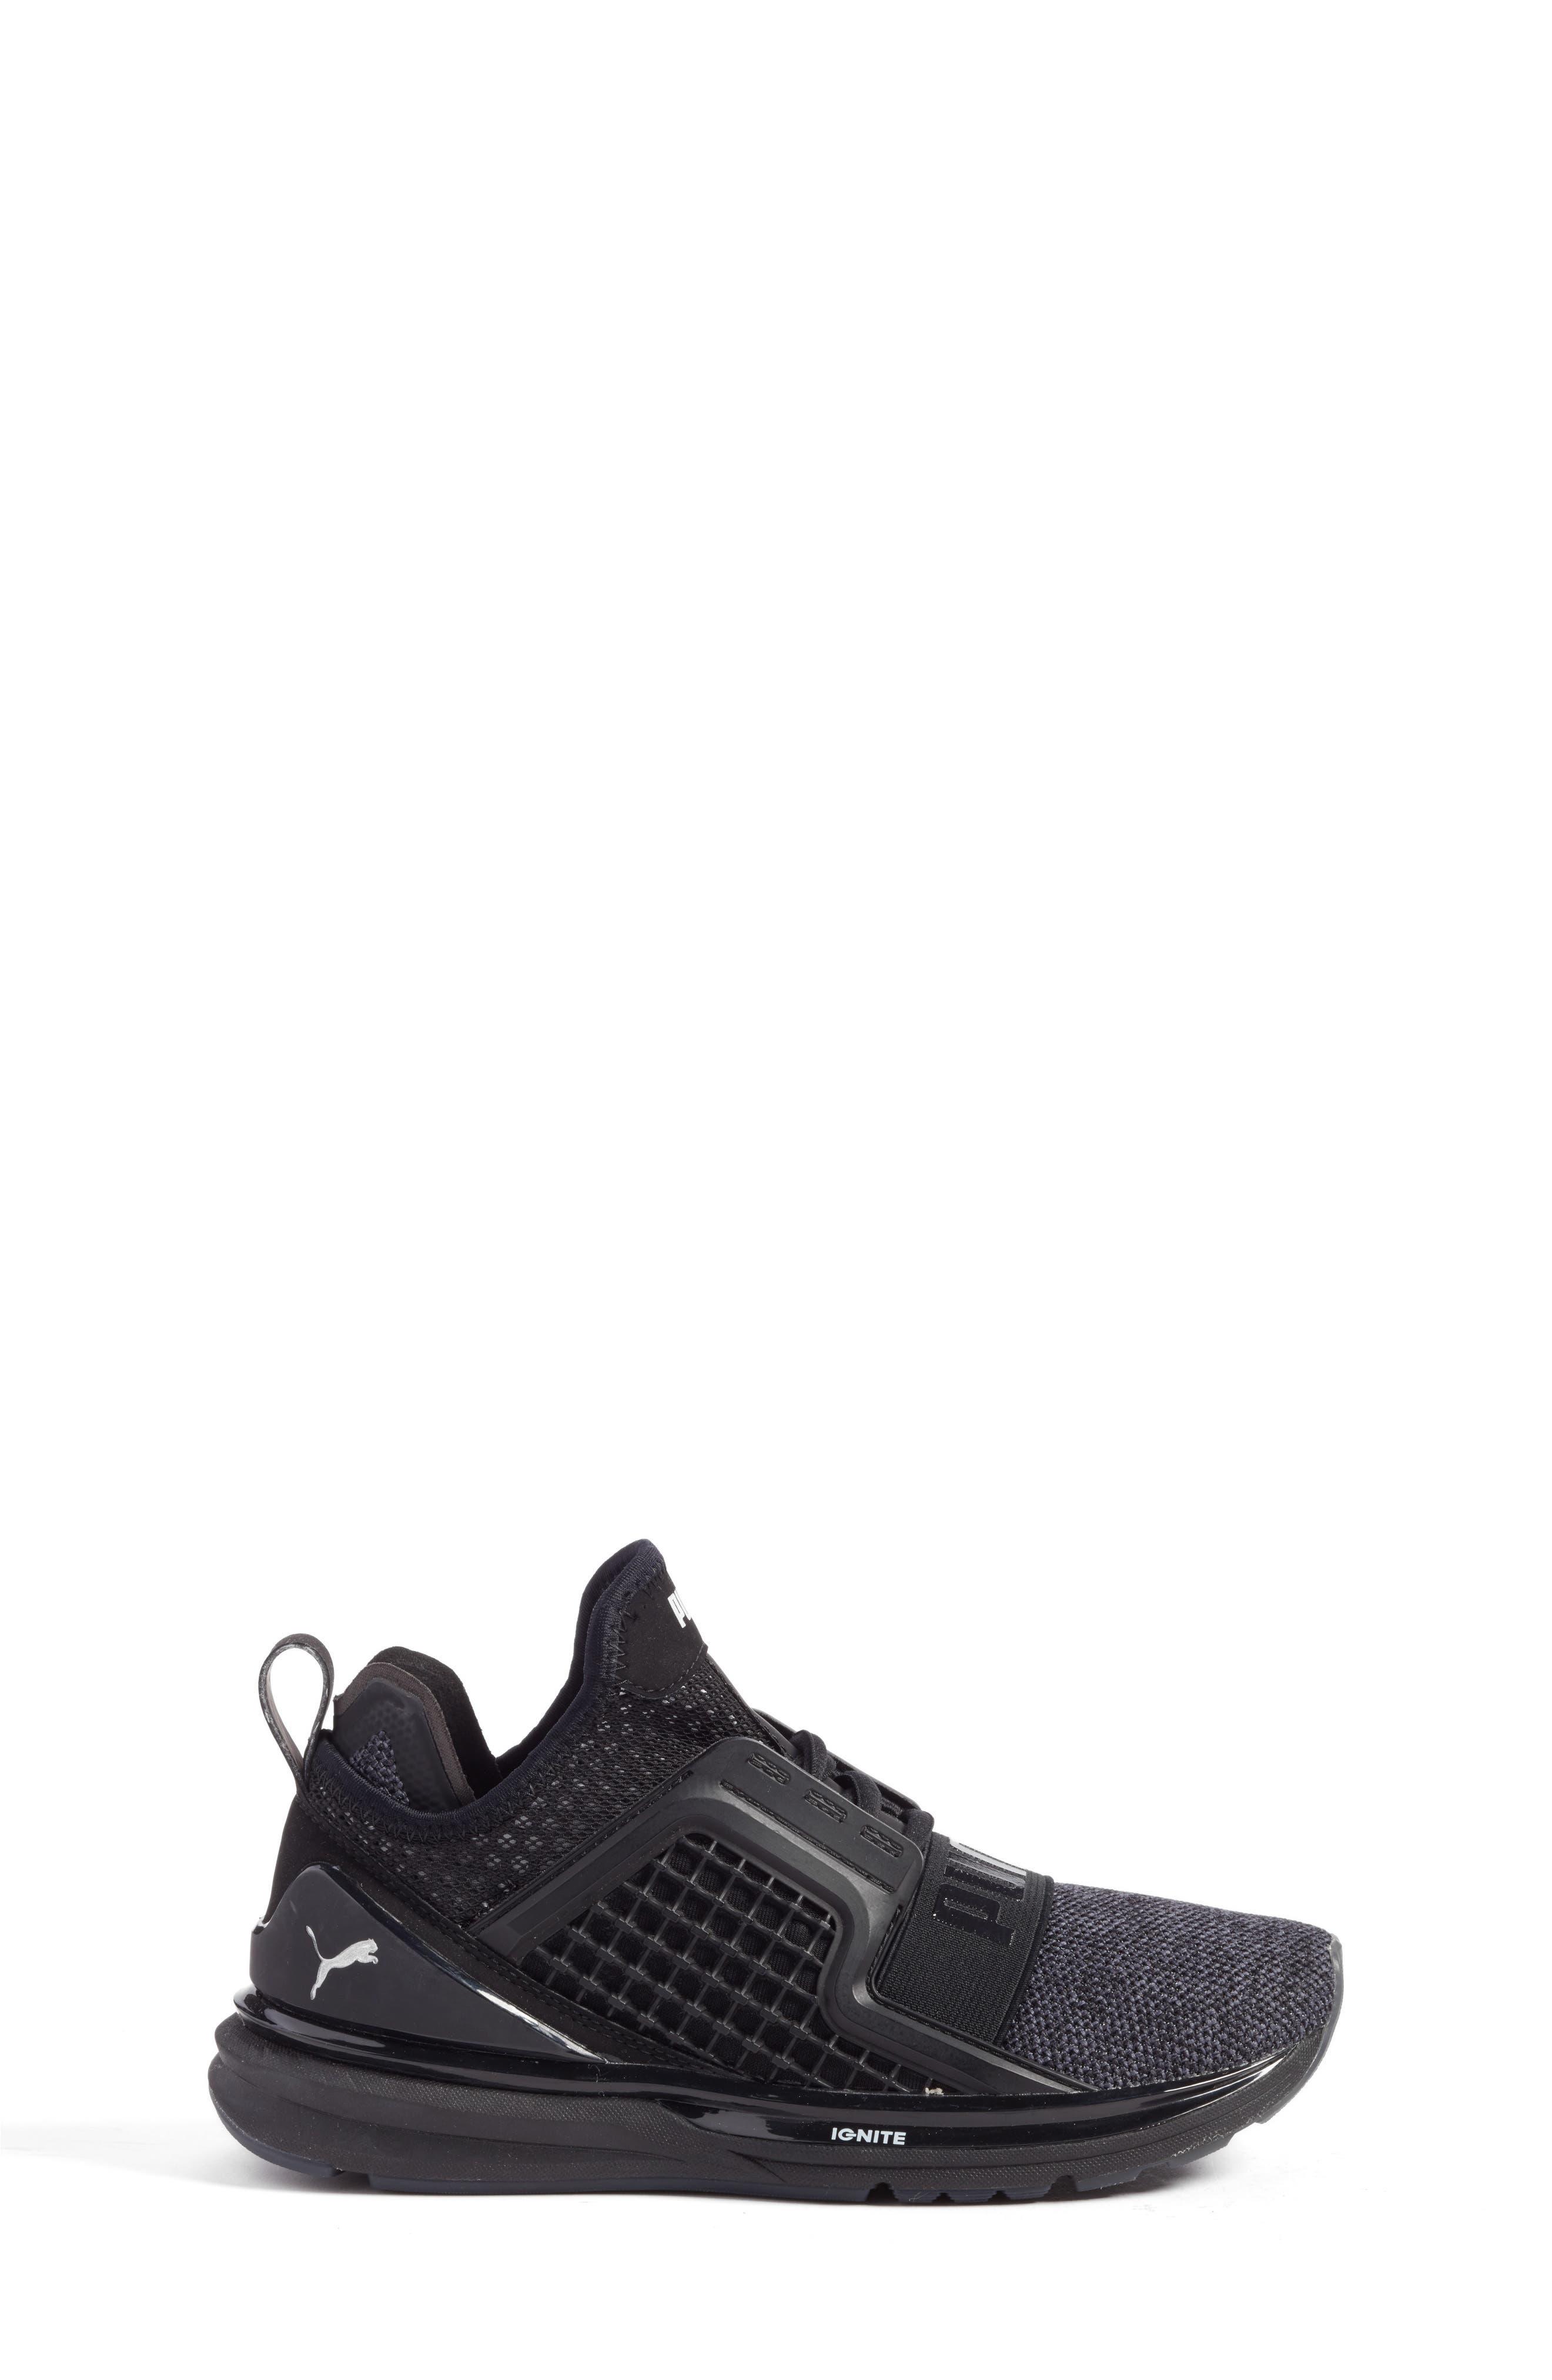 Ignite Limitless Sneaker,                             Alternate thumbnail 3, color,                             001